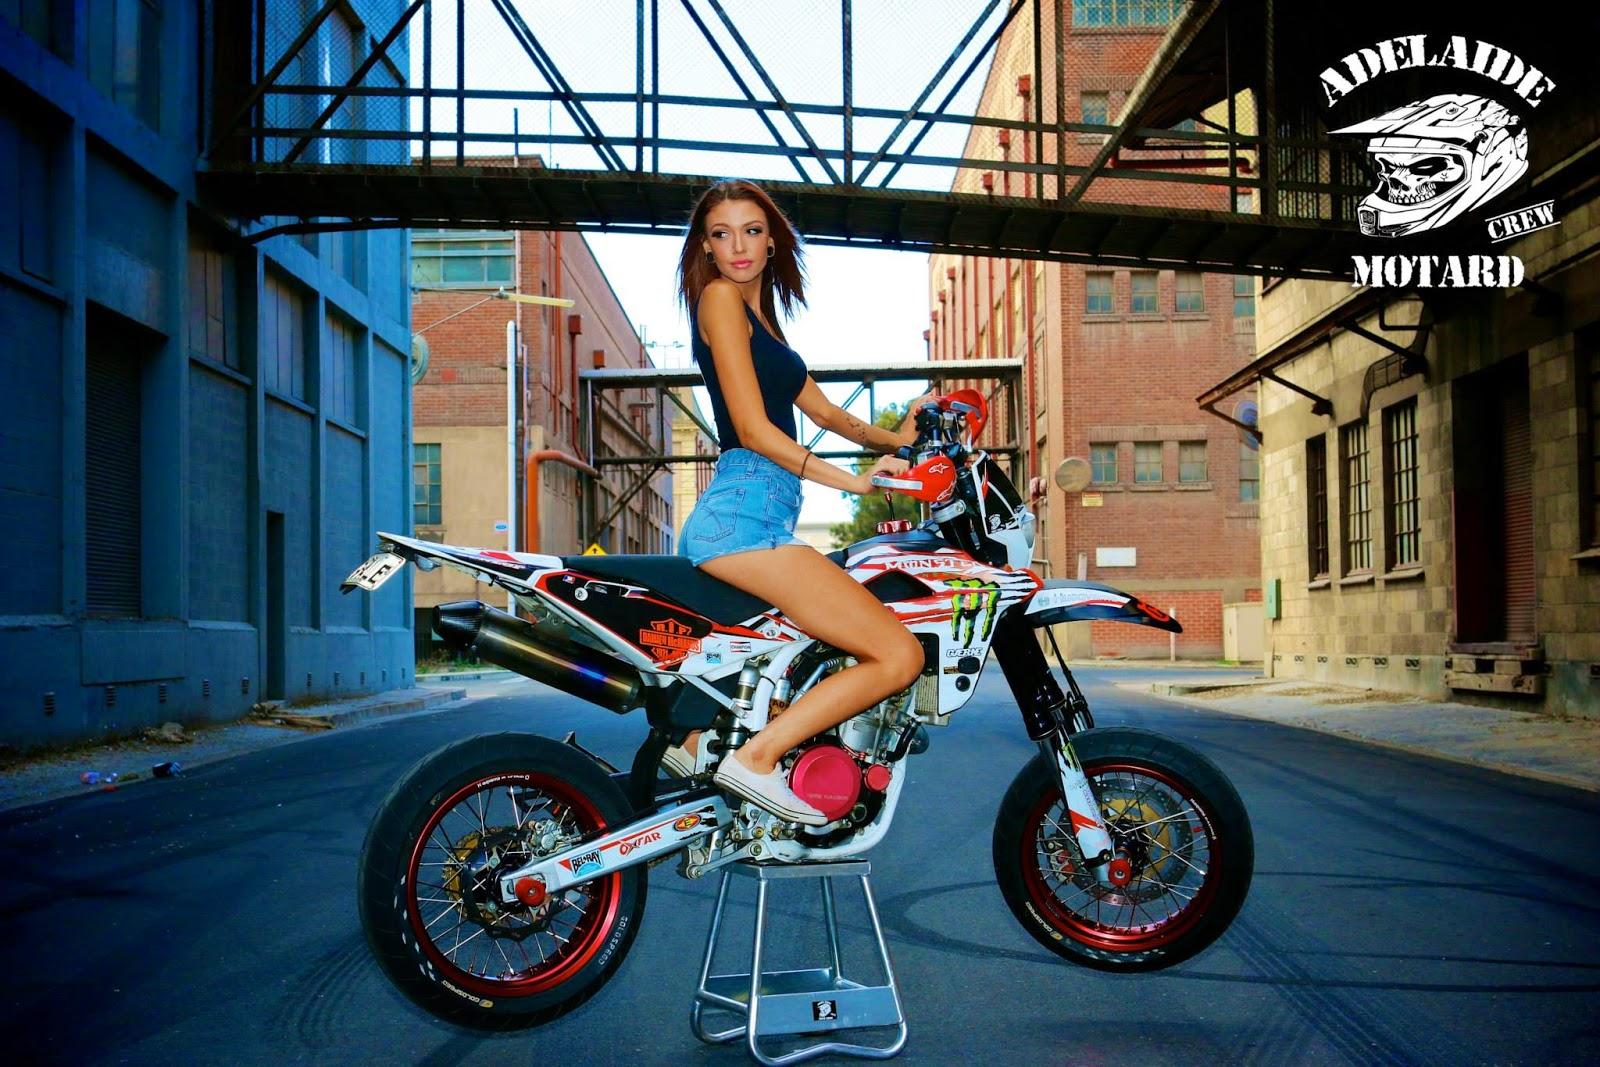 Bike And Girl Wallpaper Hd Mercenary Garage Adelaide Motard Crew